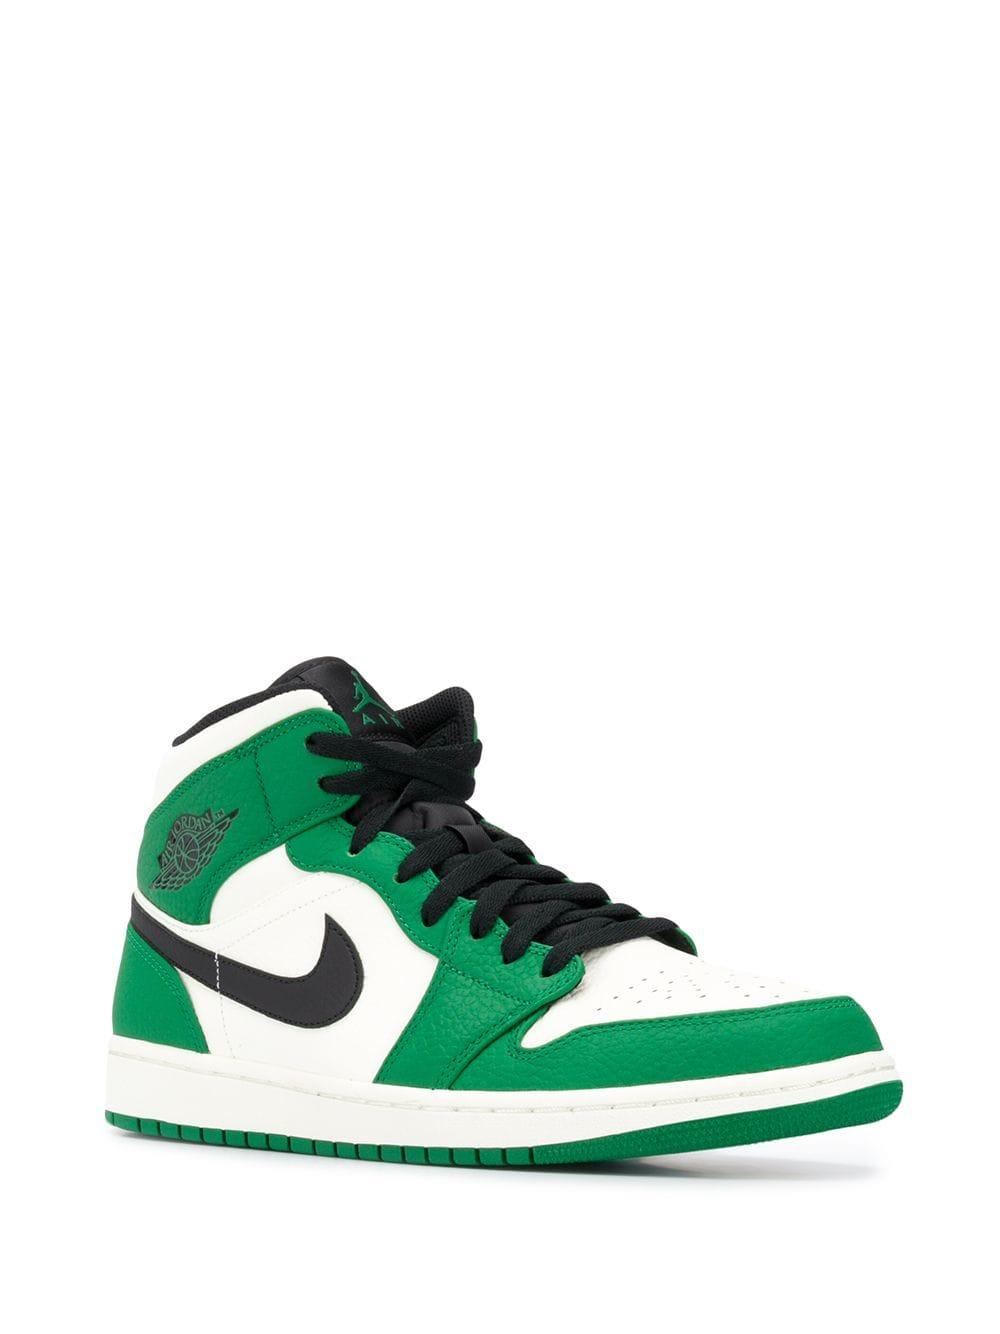 a2a0835d922801 Nike Air Jordan 1 Mid Sneakers in Green for Men - Lyst